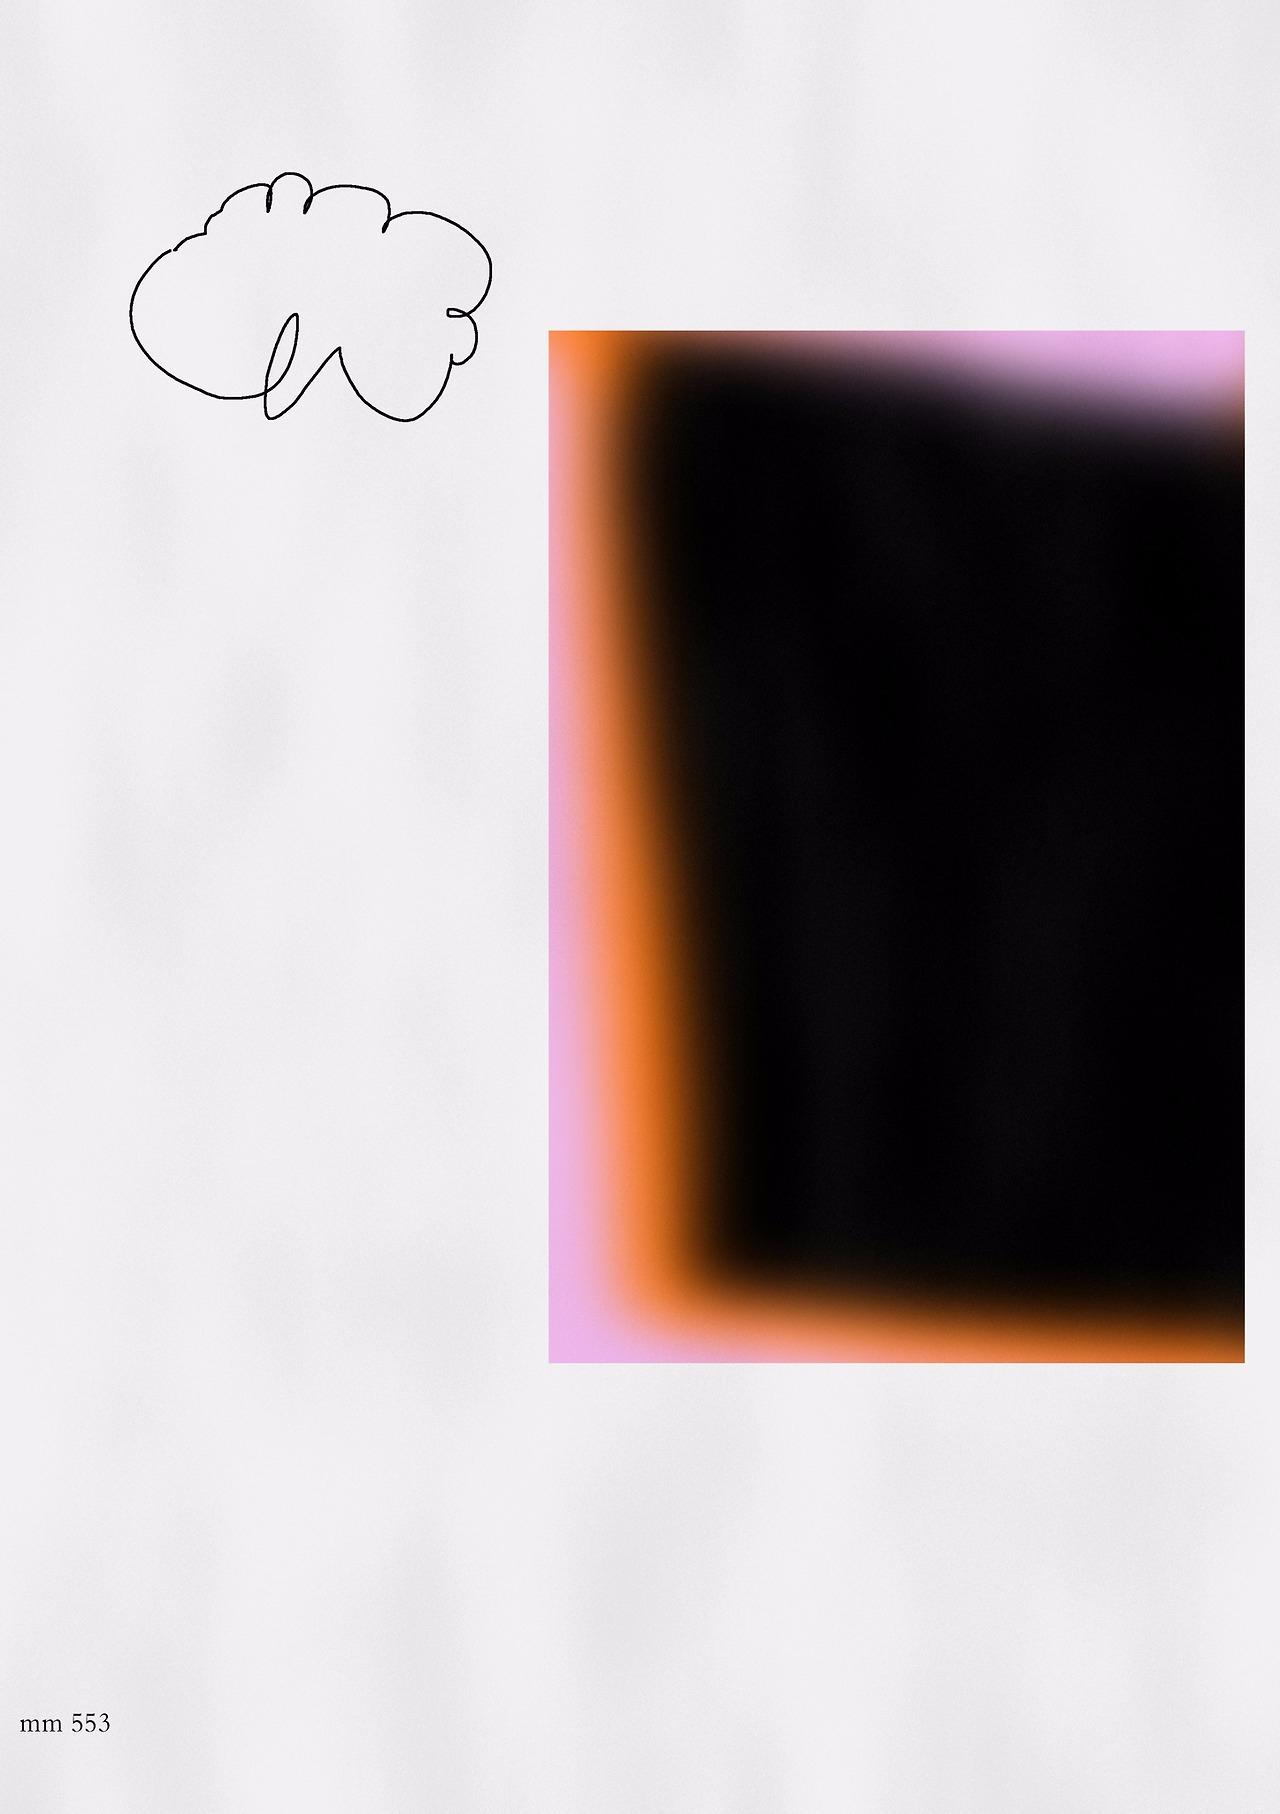 Mars Maiers: 553 - design, contemporary - modernism_is_crap | ello